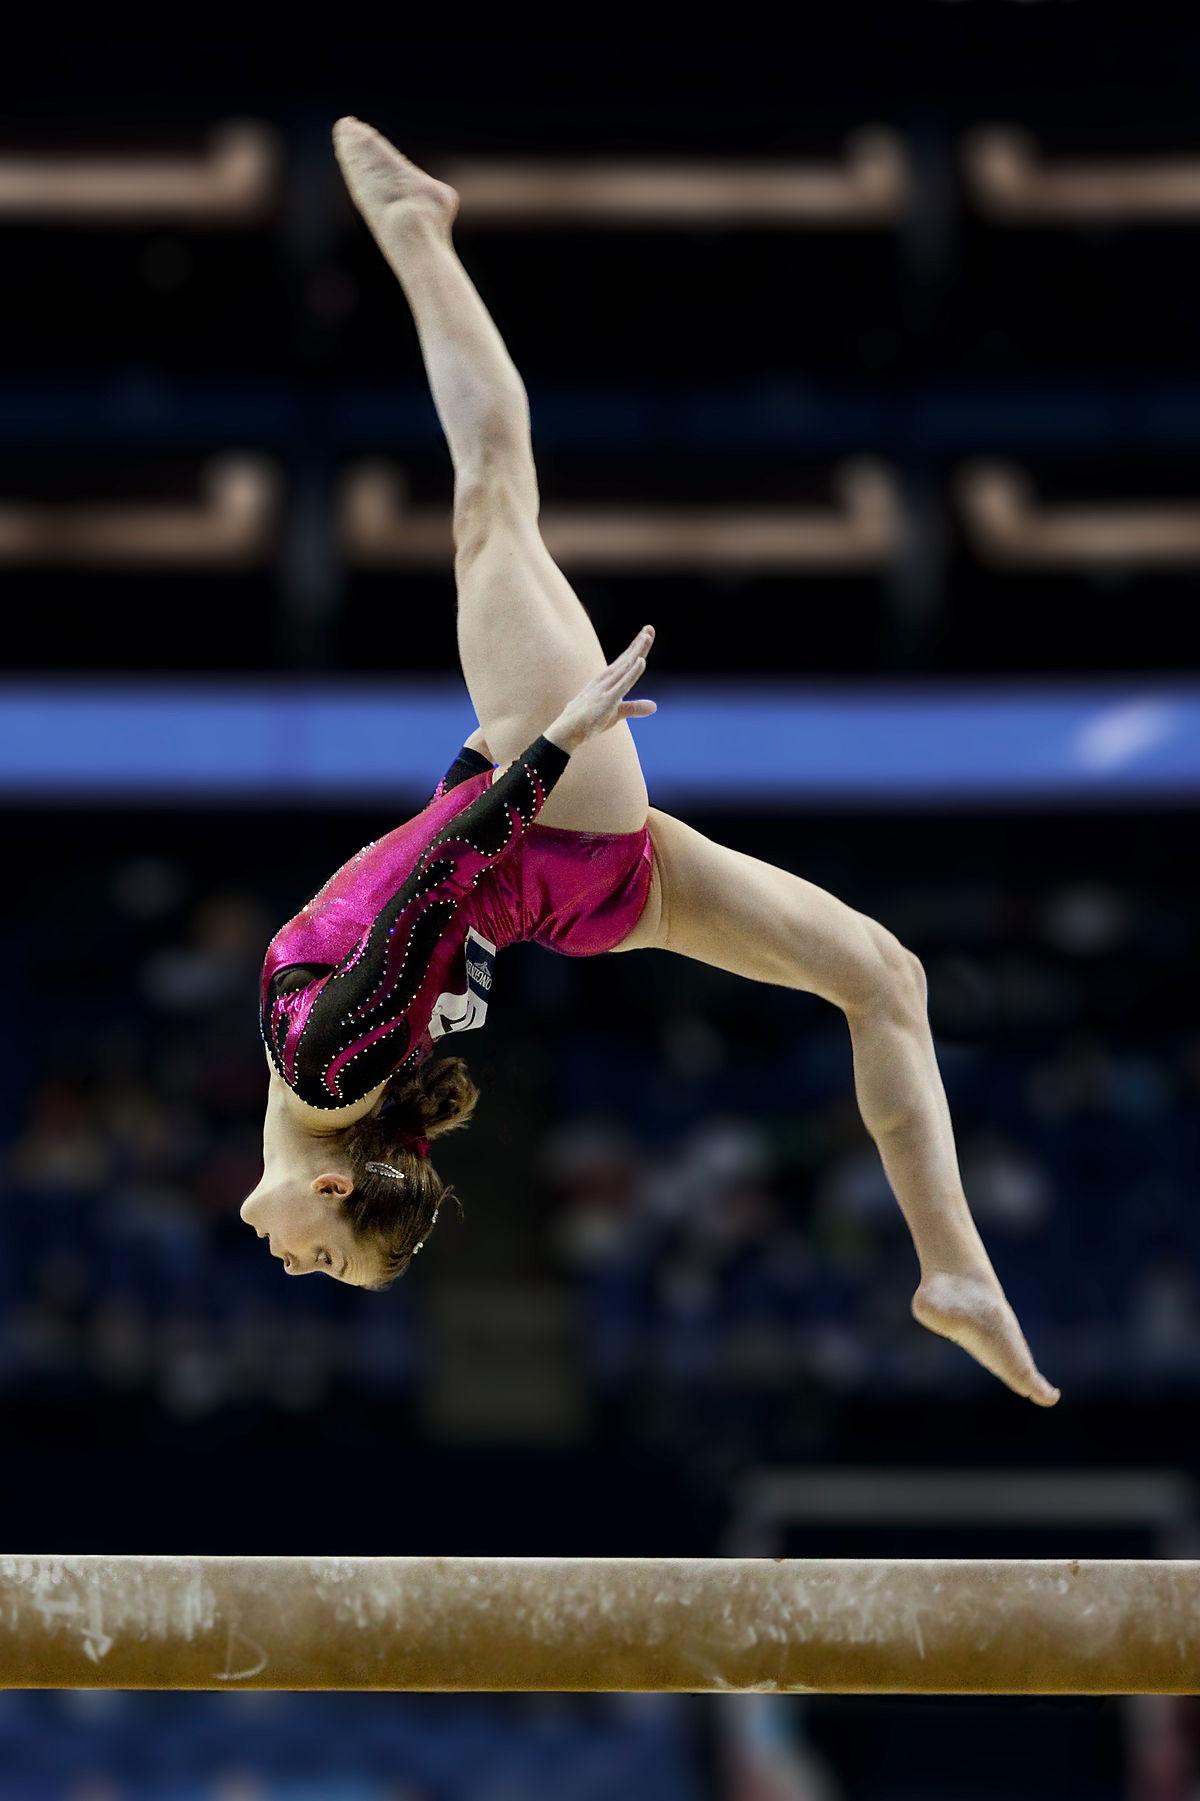 Gymnastics on Shapes Activities